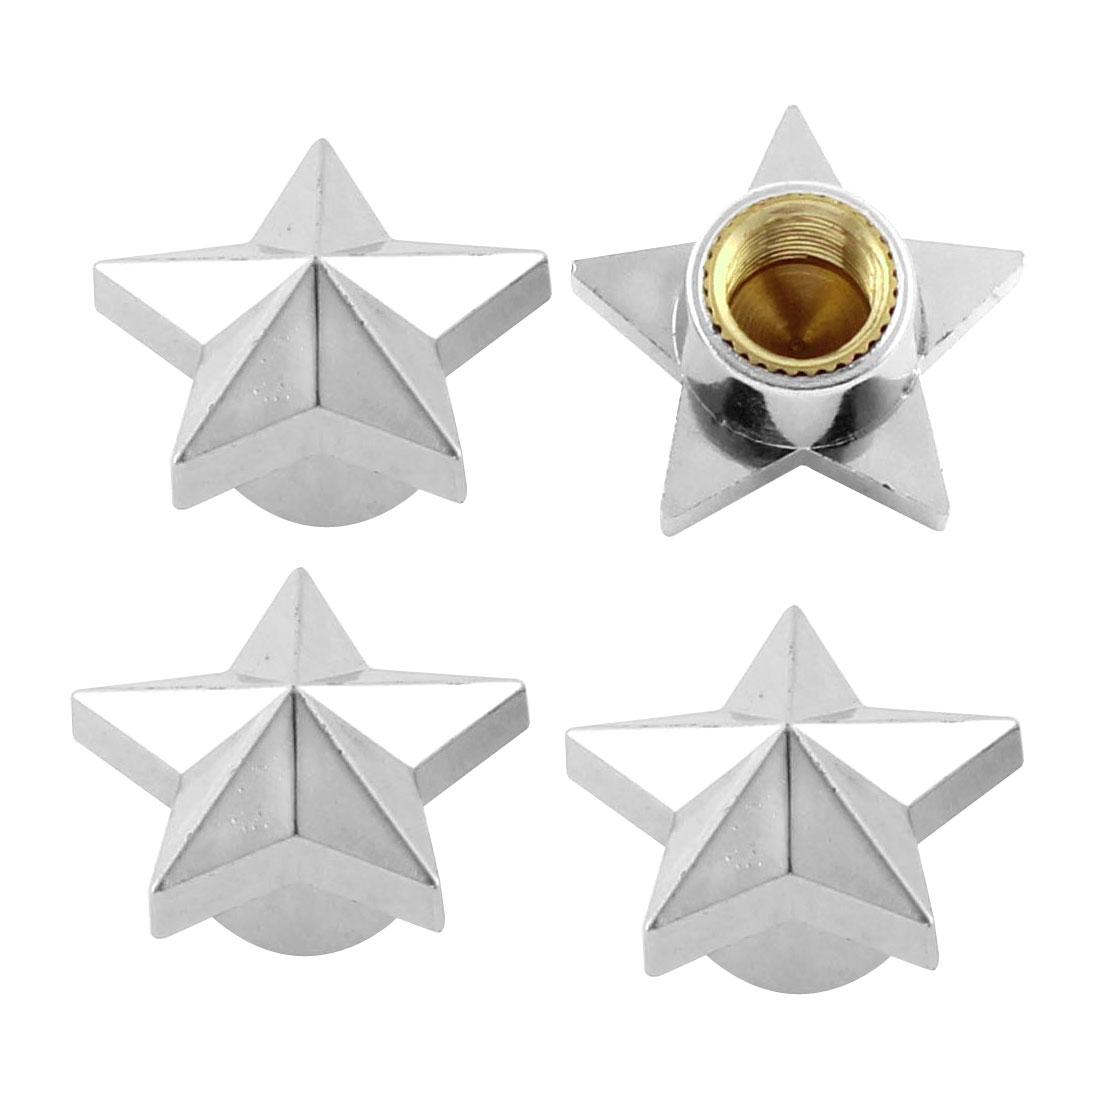 4 Pcs Silver Tone Stars Shape Tyre Valve Caps Protectors 8mm Hole Dia